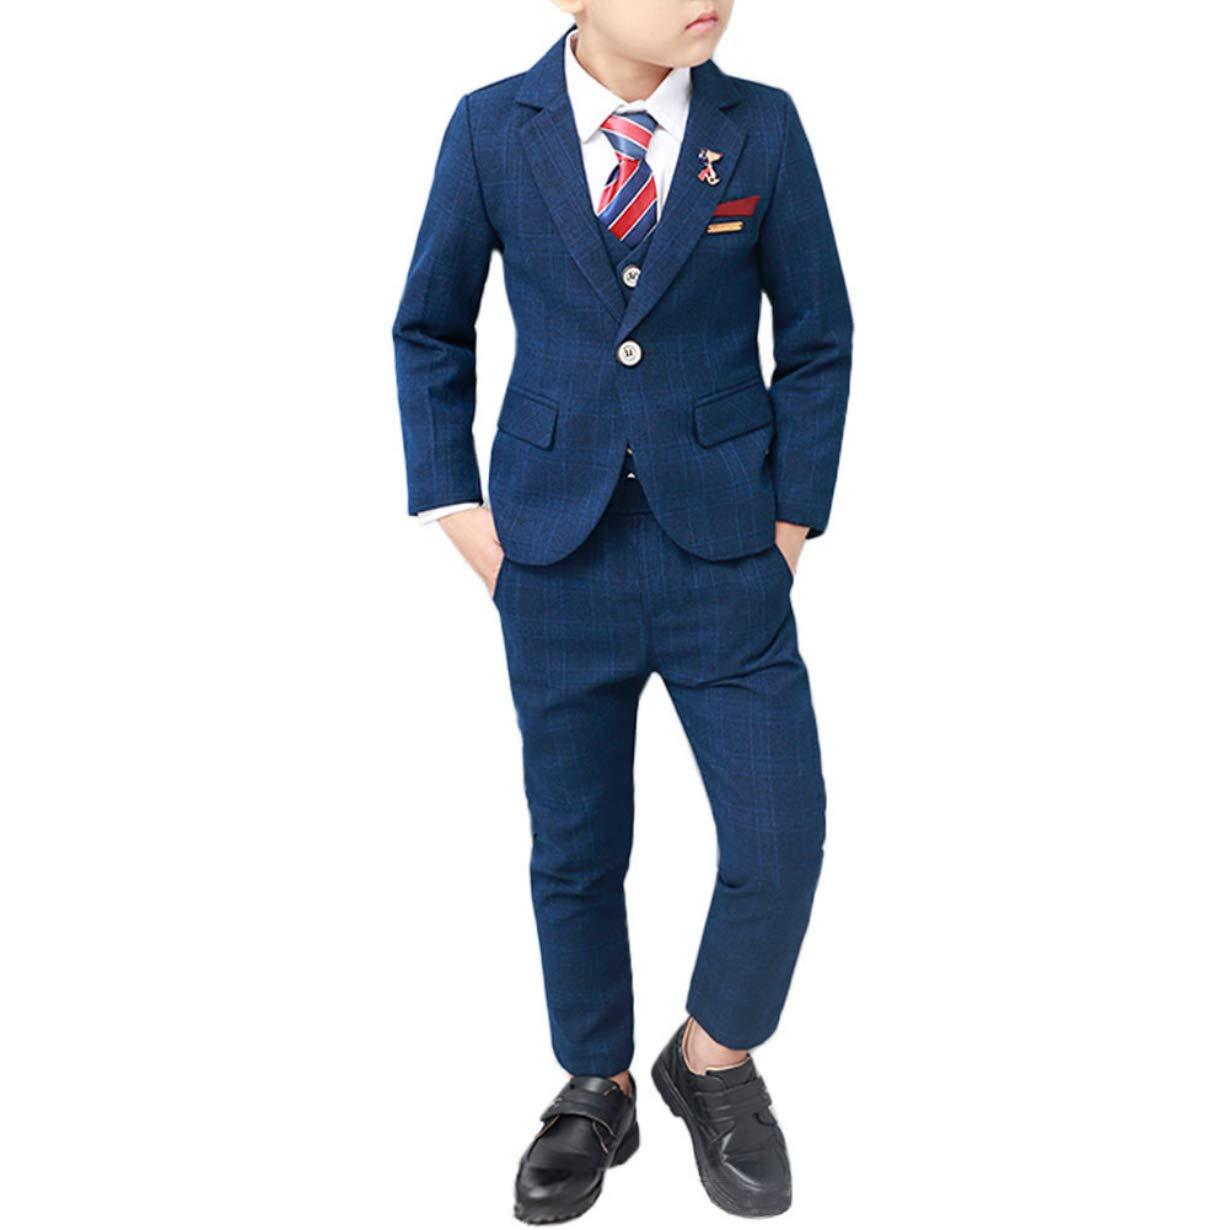 Kids Formal Boys Suits Tuxedo with Blazer Vest and Pants Sets Size 5T Blue2 110 cm